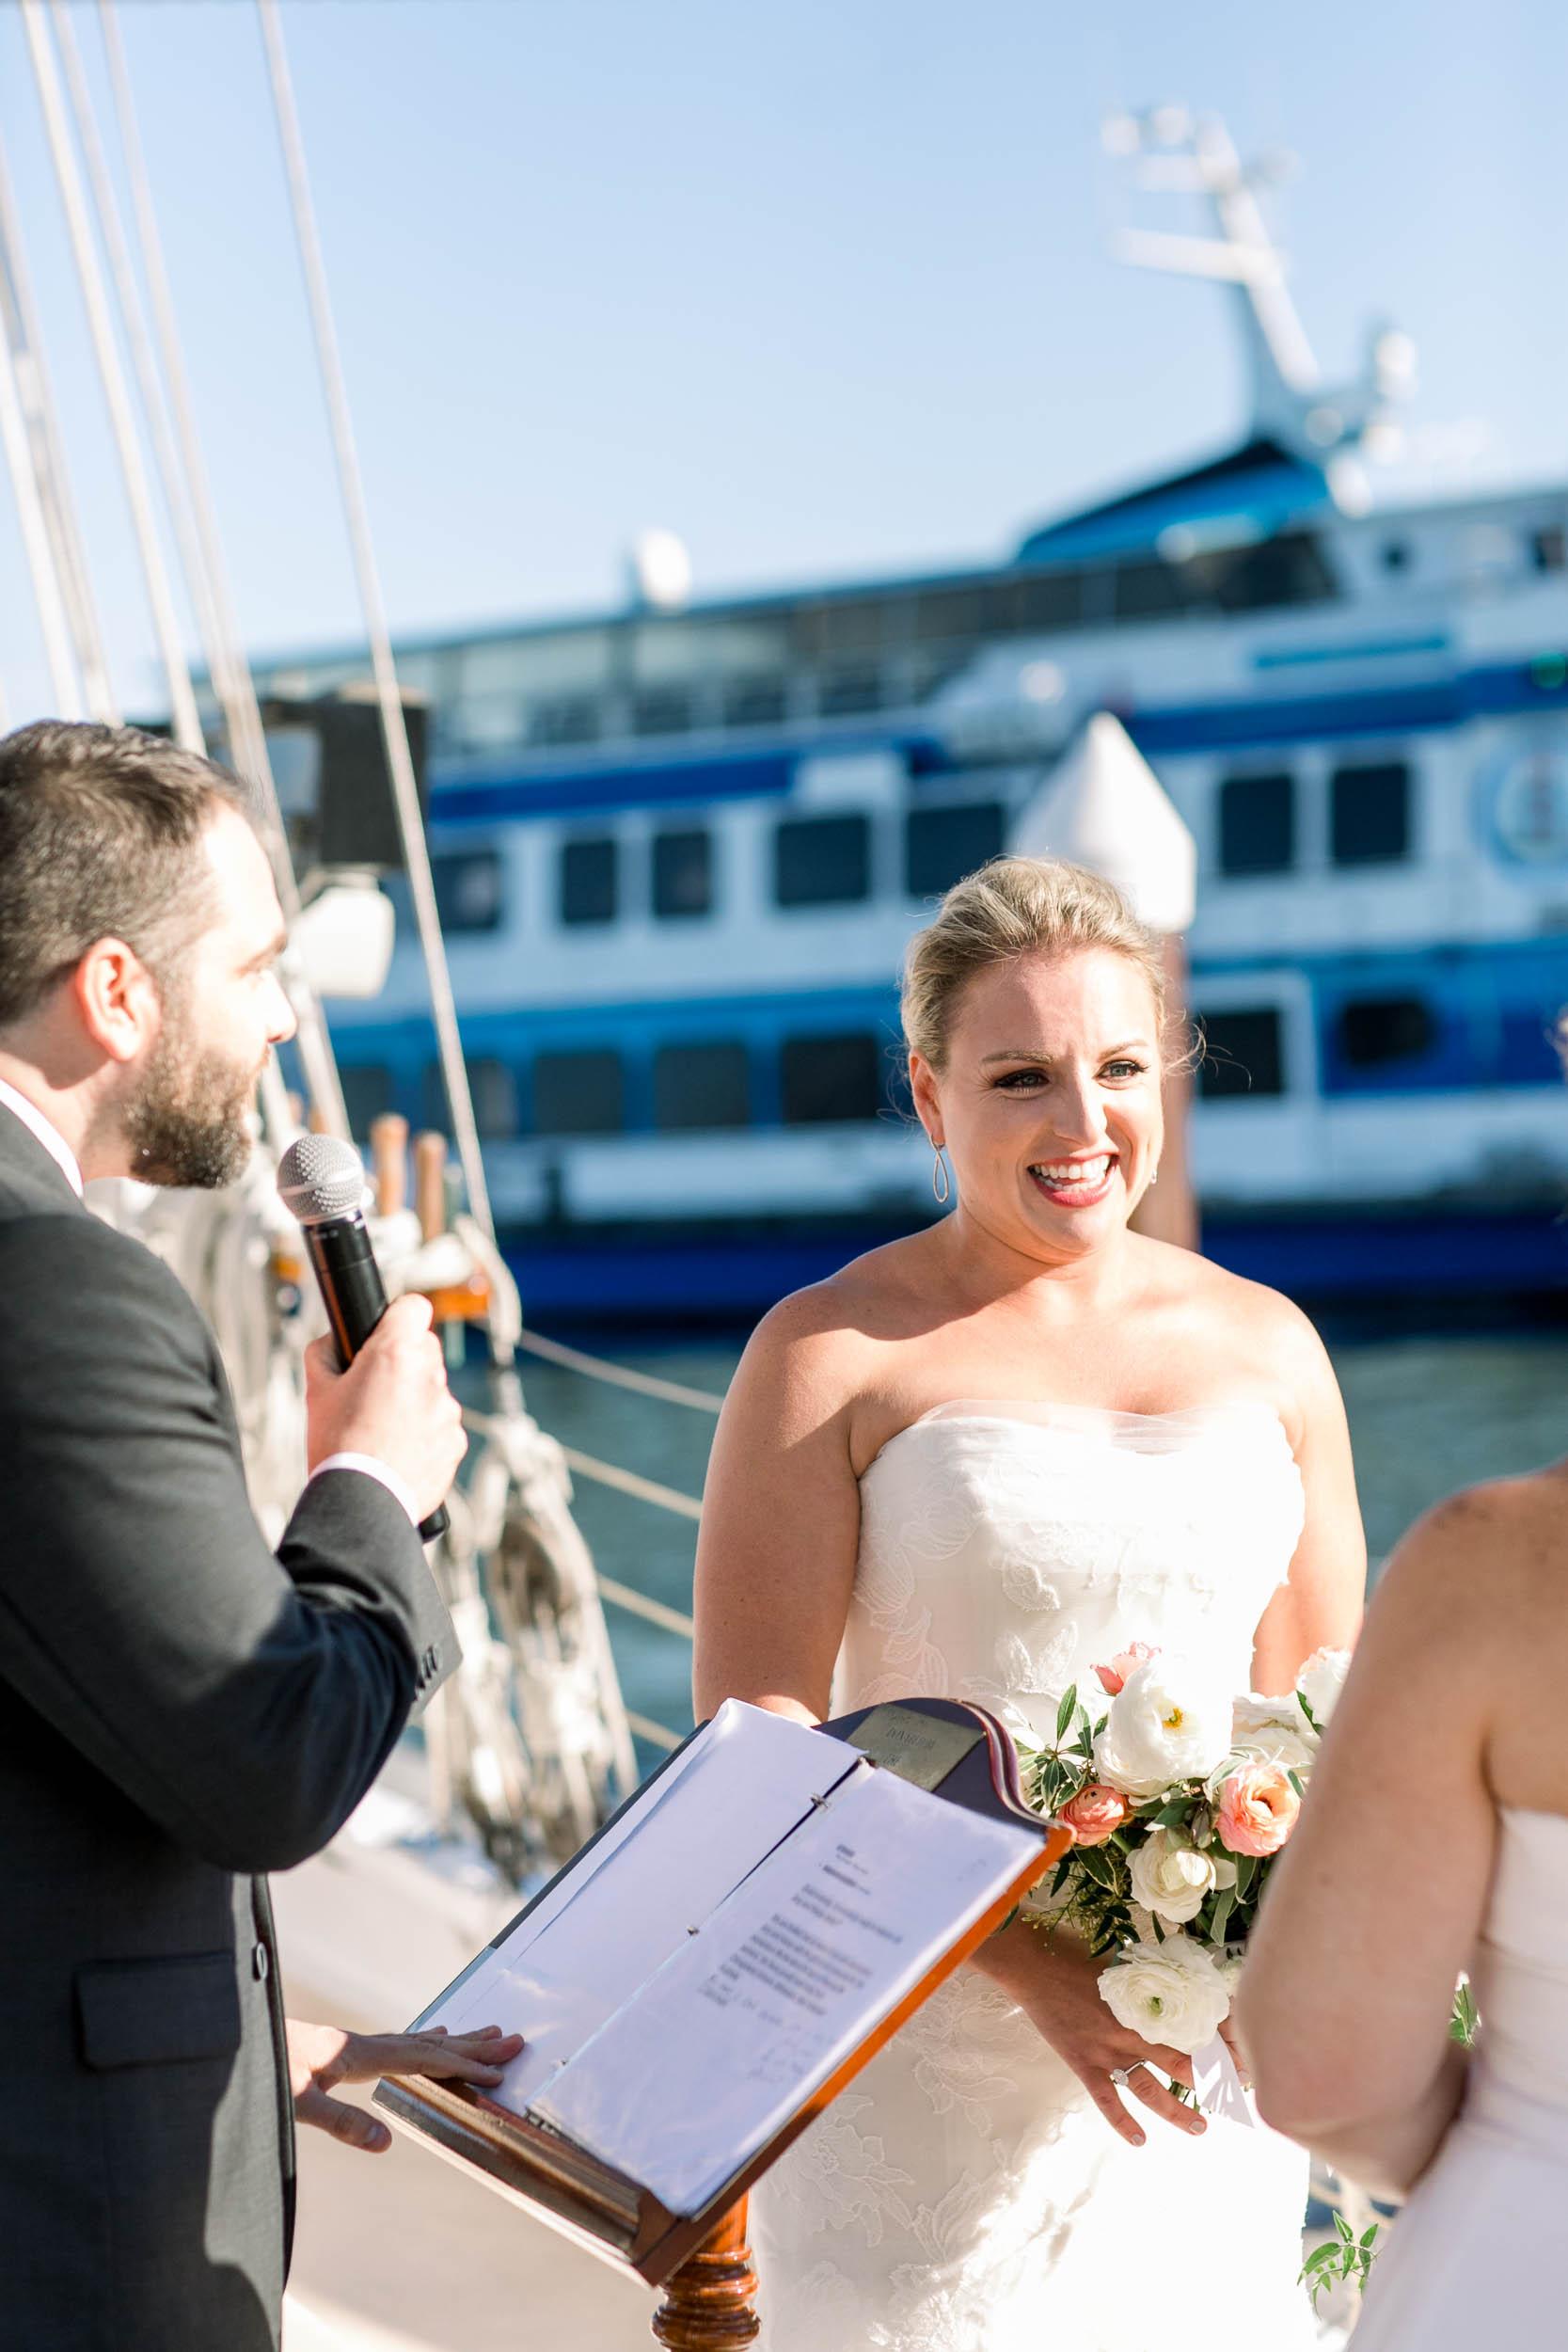 092218ER473_Sausalito Yacht Club Wedding_Buena Lane Photography.jpg